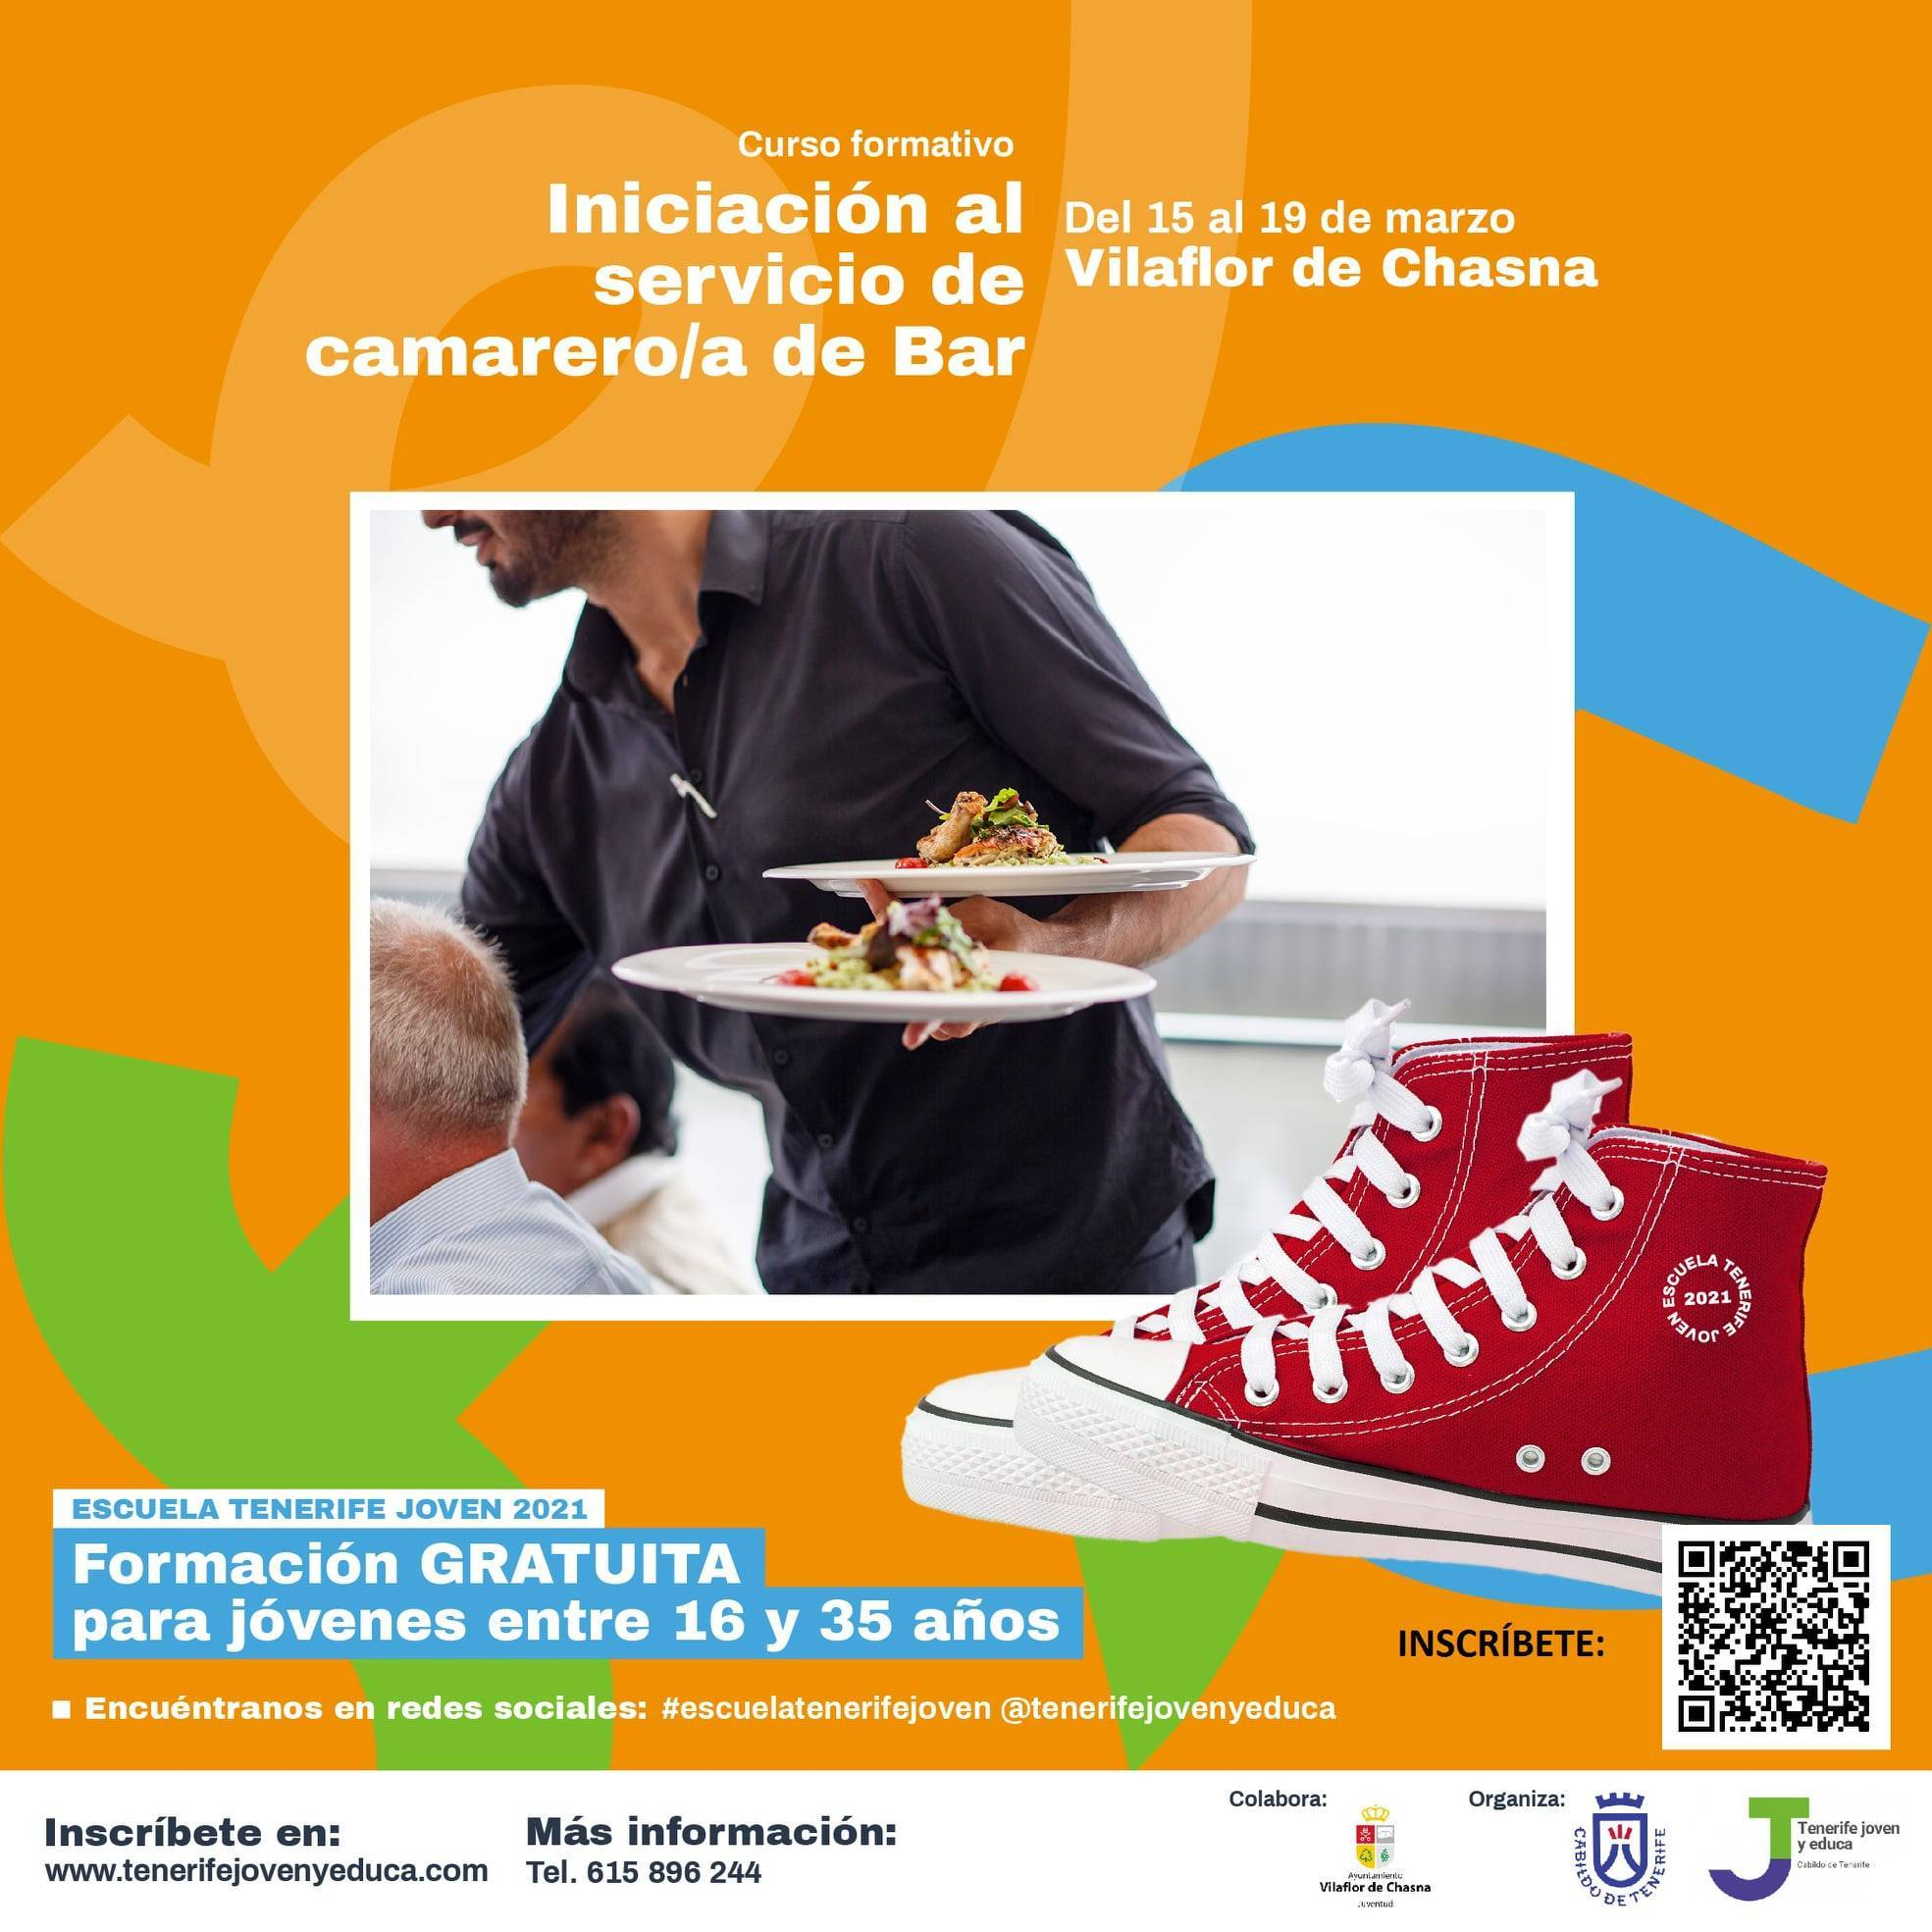 Curso de iniciación al servicio de camarero-a de bar (2021) - Vilaflor de Chasna (Santa Cruz de Tenerife)